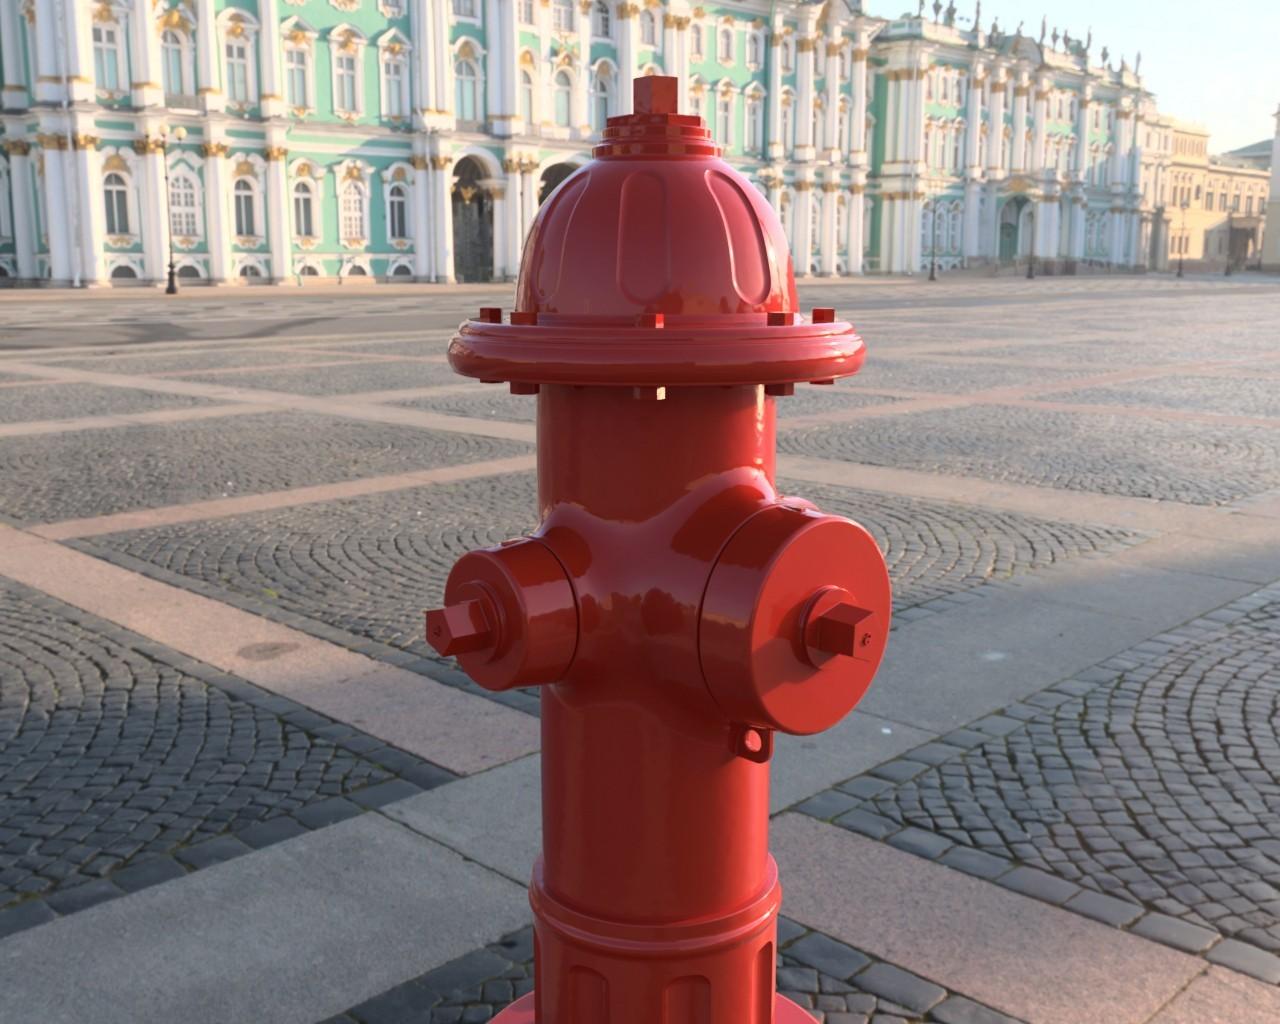 Fire_hydrant_2017-Nov-09_01-51-12PM-000_CustomizedView11216168818_jpg.jpg Download STL file Fire hydrant • Model to 3D print, AntonShtern